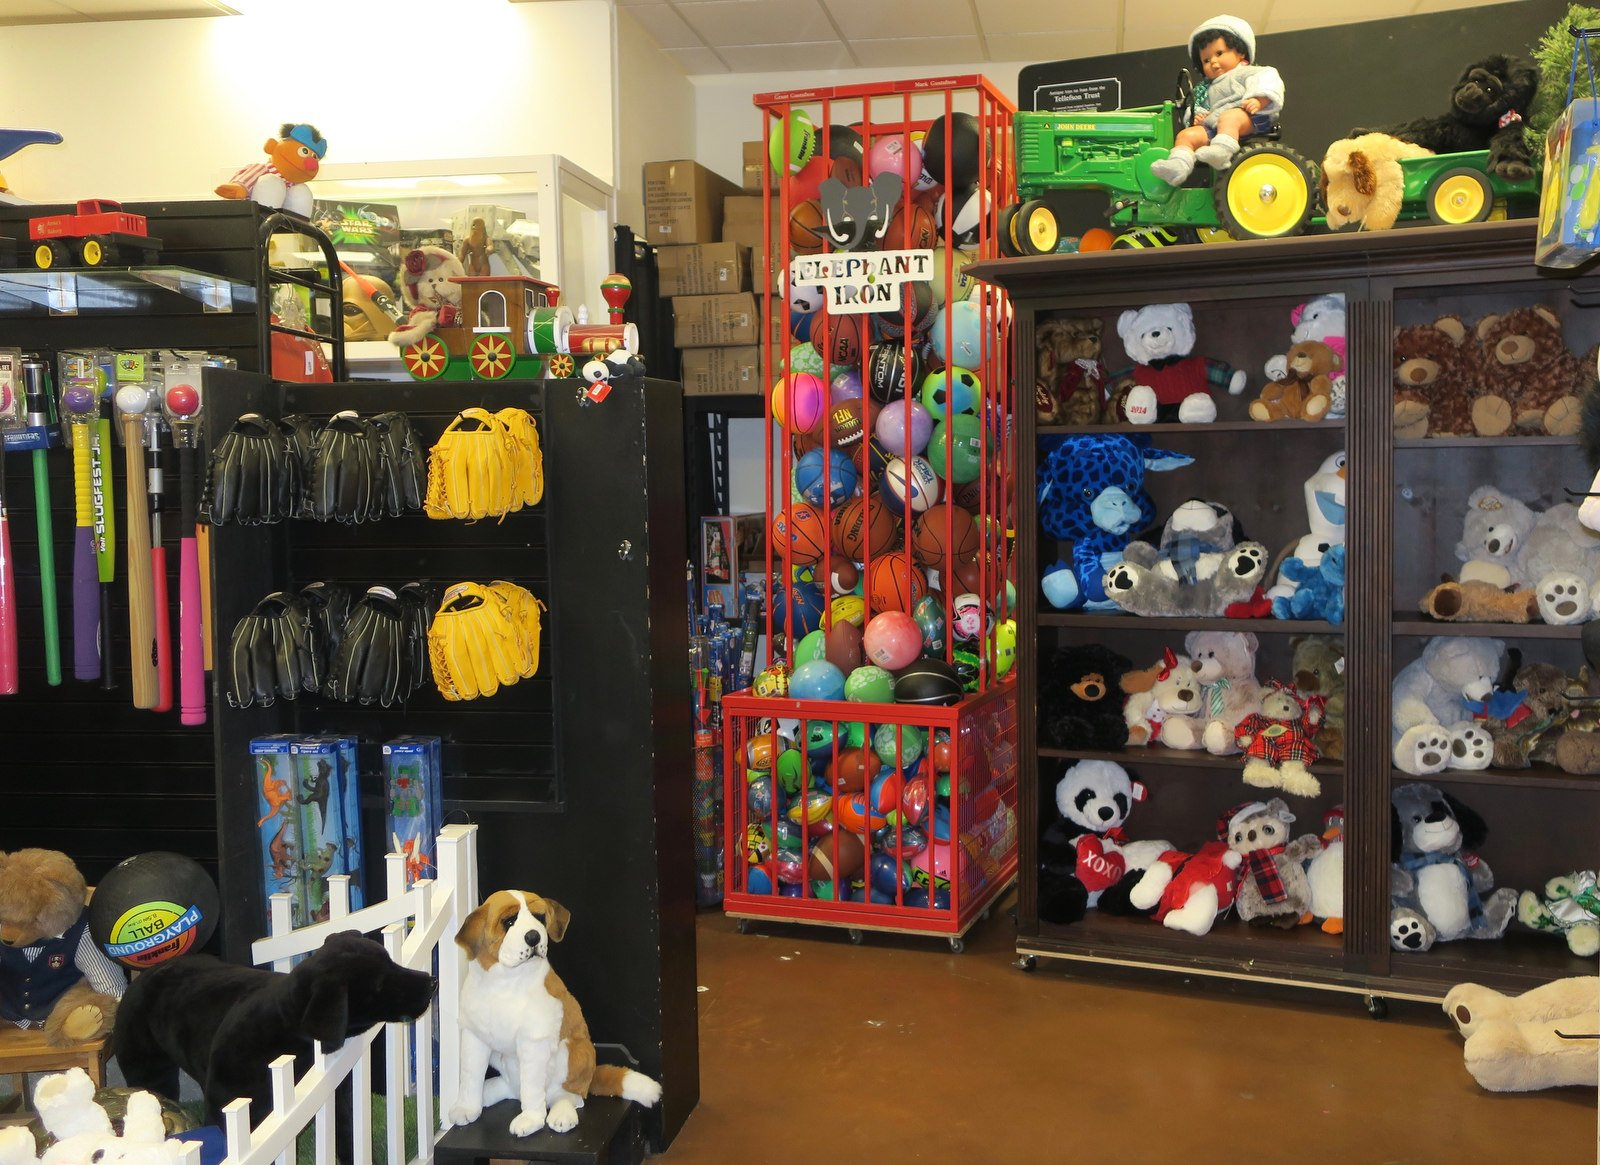 Santa Barbara Moving and Storage Company Offers Holiday Storage